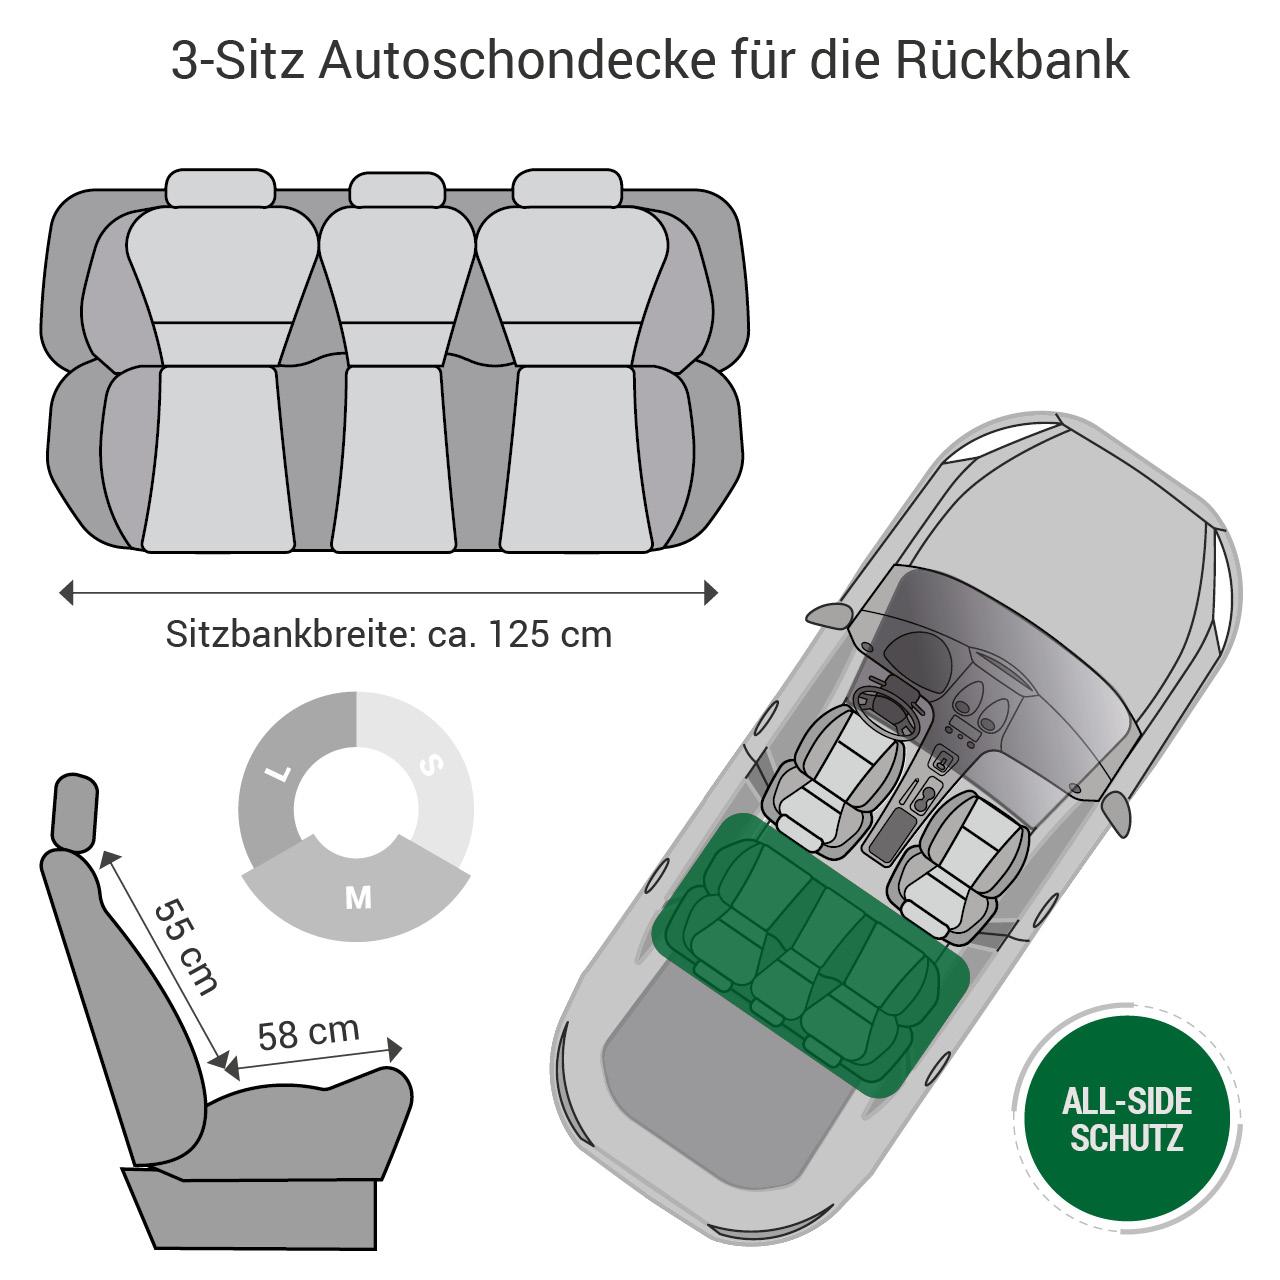 Doctor Bark - Autoschondecke für Hunde - Rückbank 3-Sitz Gr. M - grau